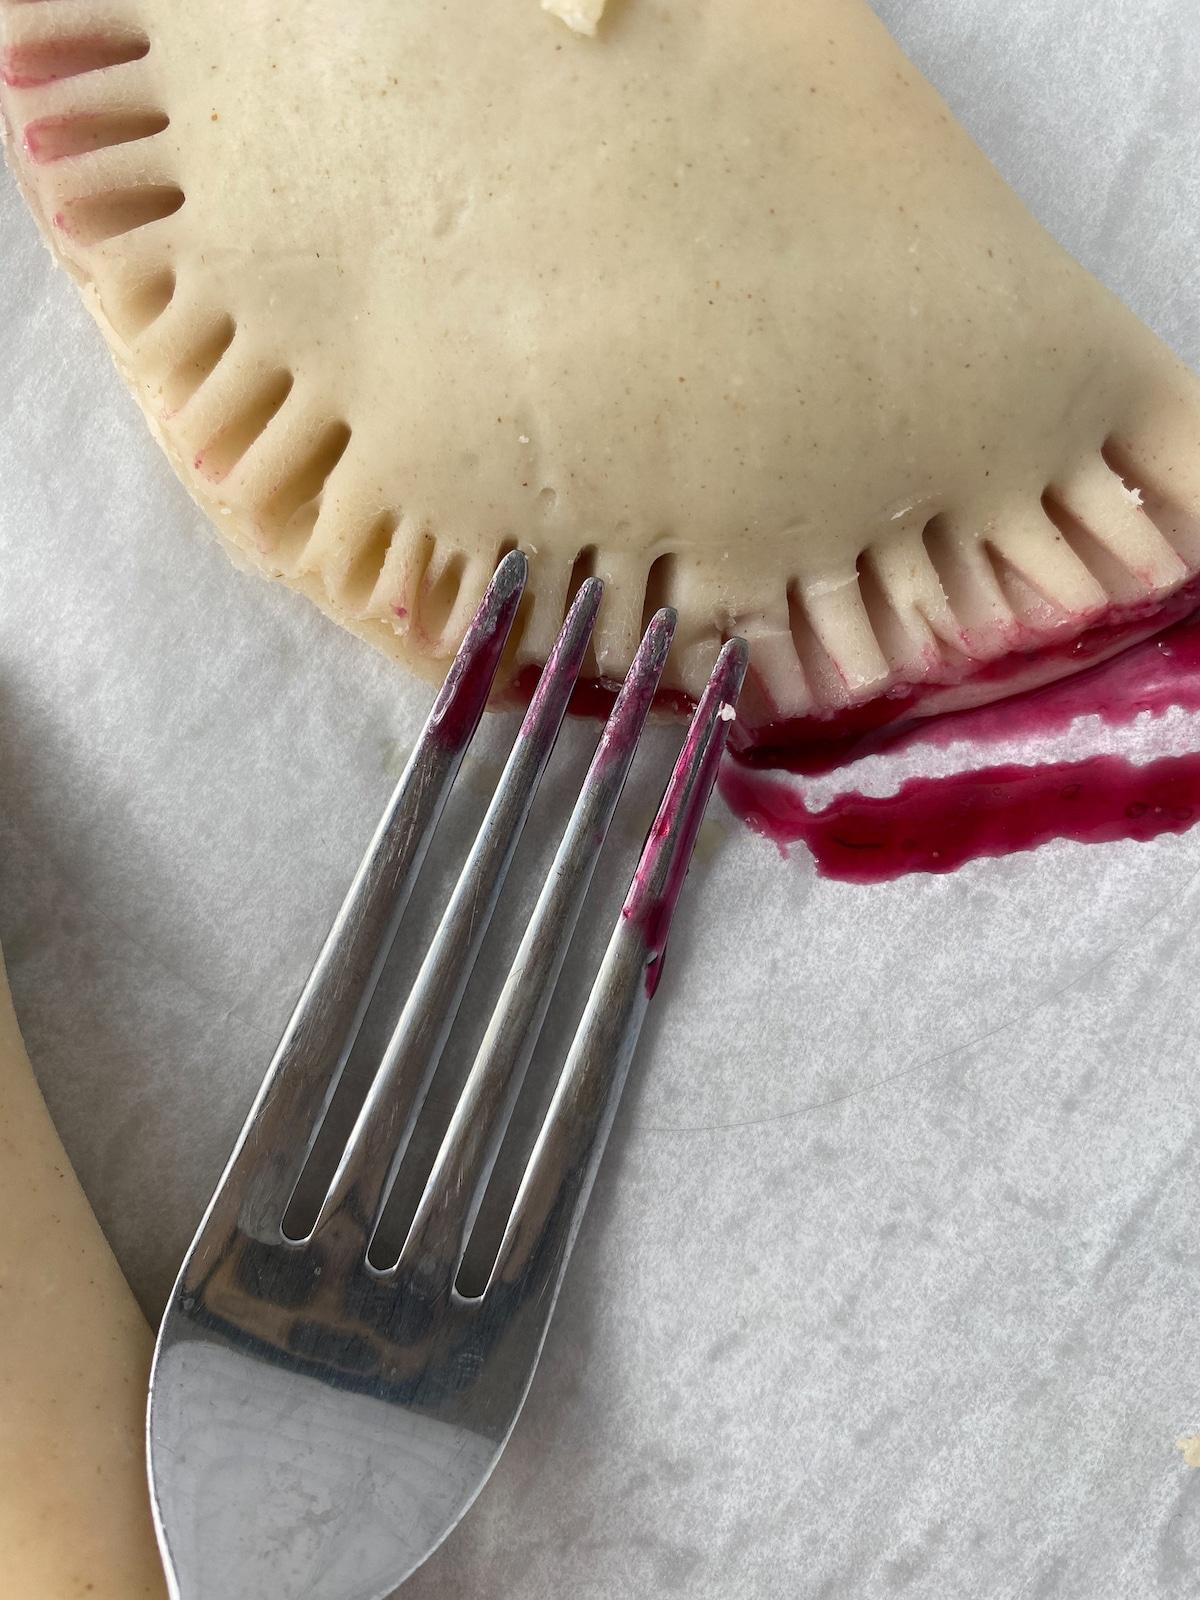 Crimping hand pies edges